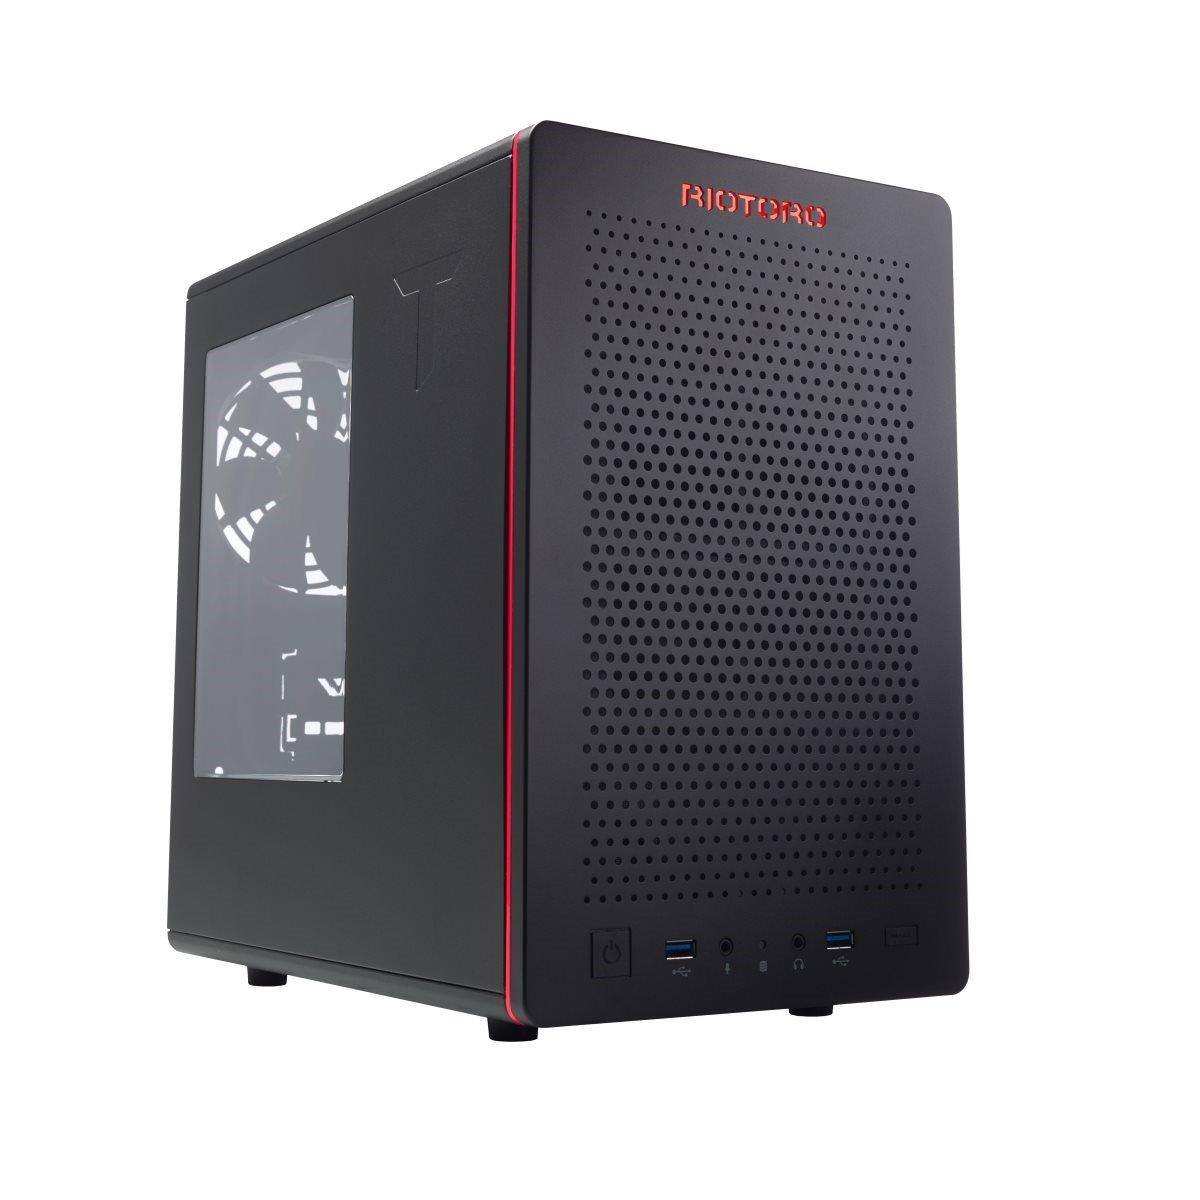 RIOTORO CR280 Mini ITX Desktop Case + 3 Artic Fans Total price £51.54 delv. from CCLOnline.